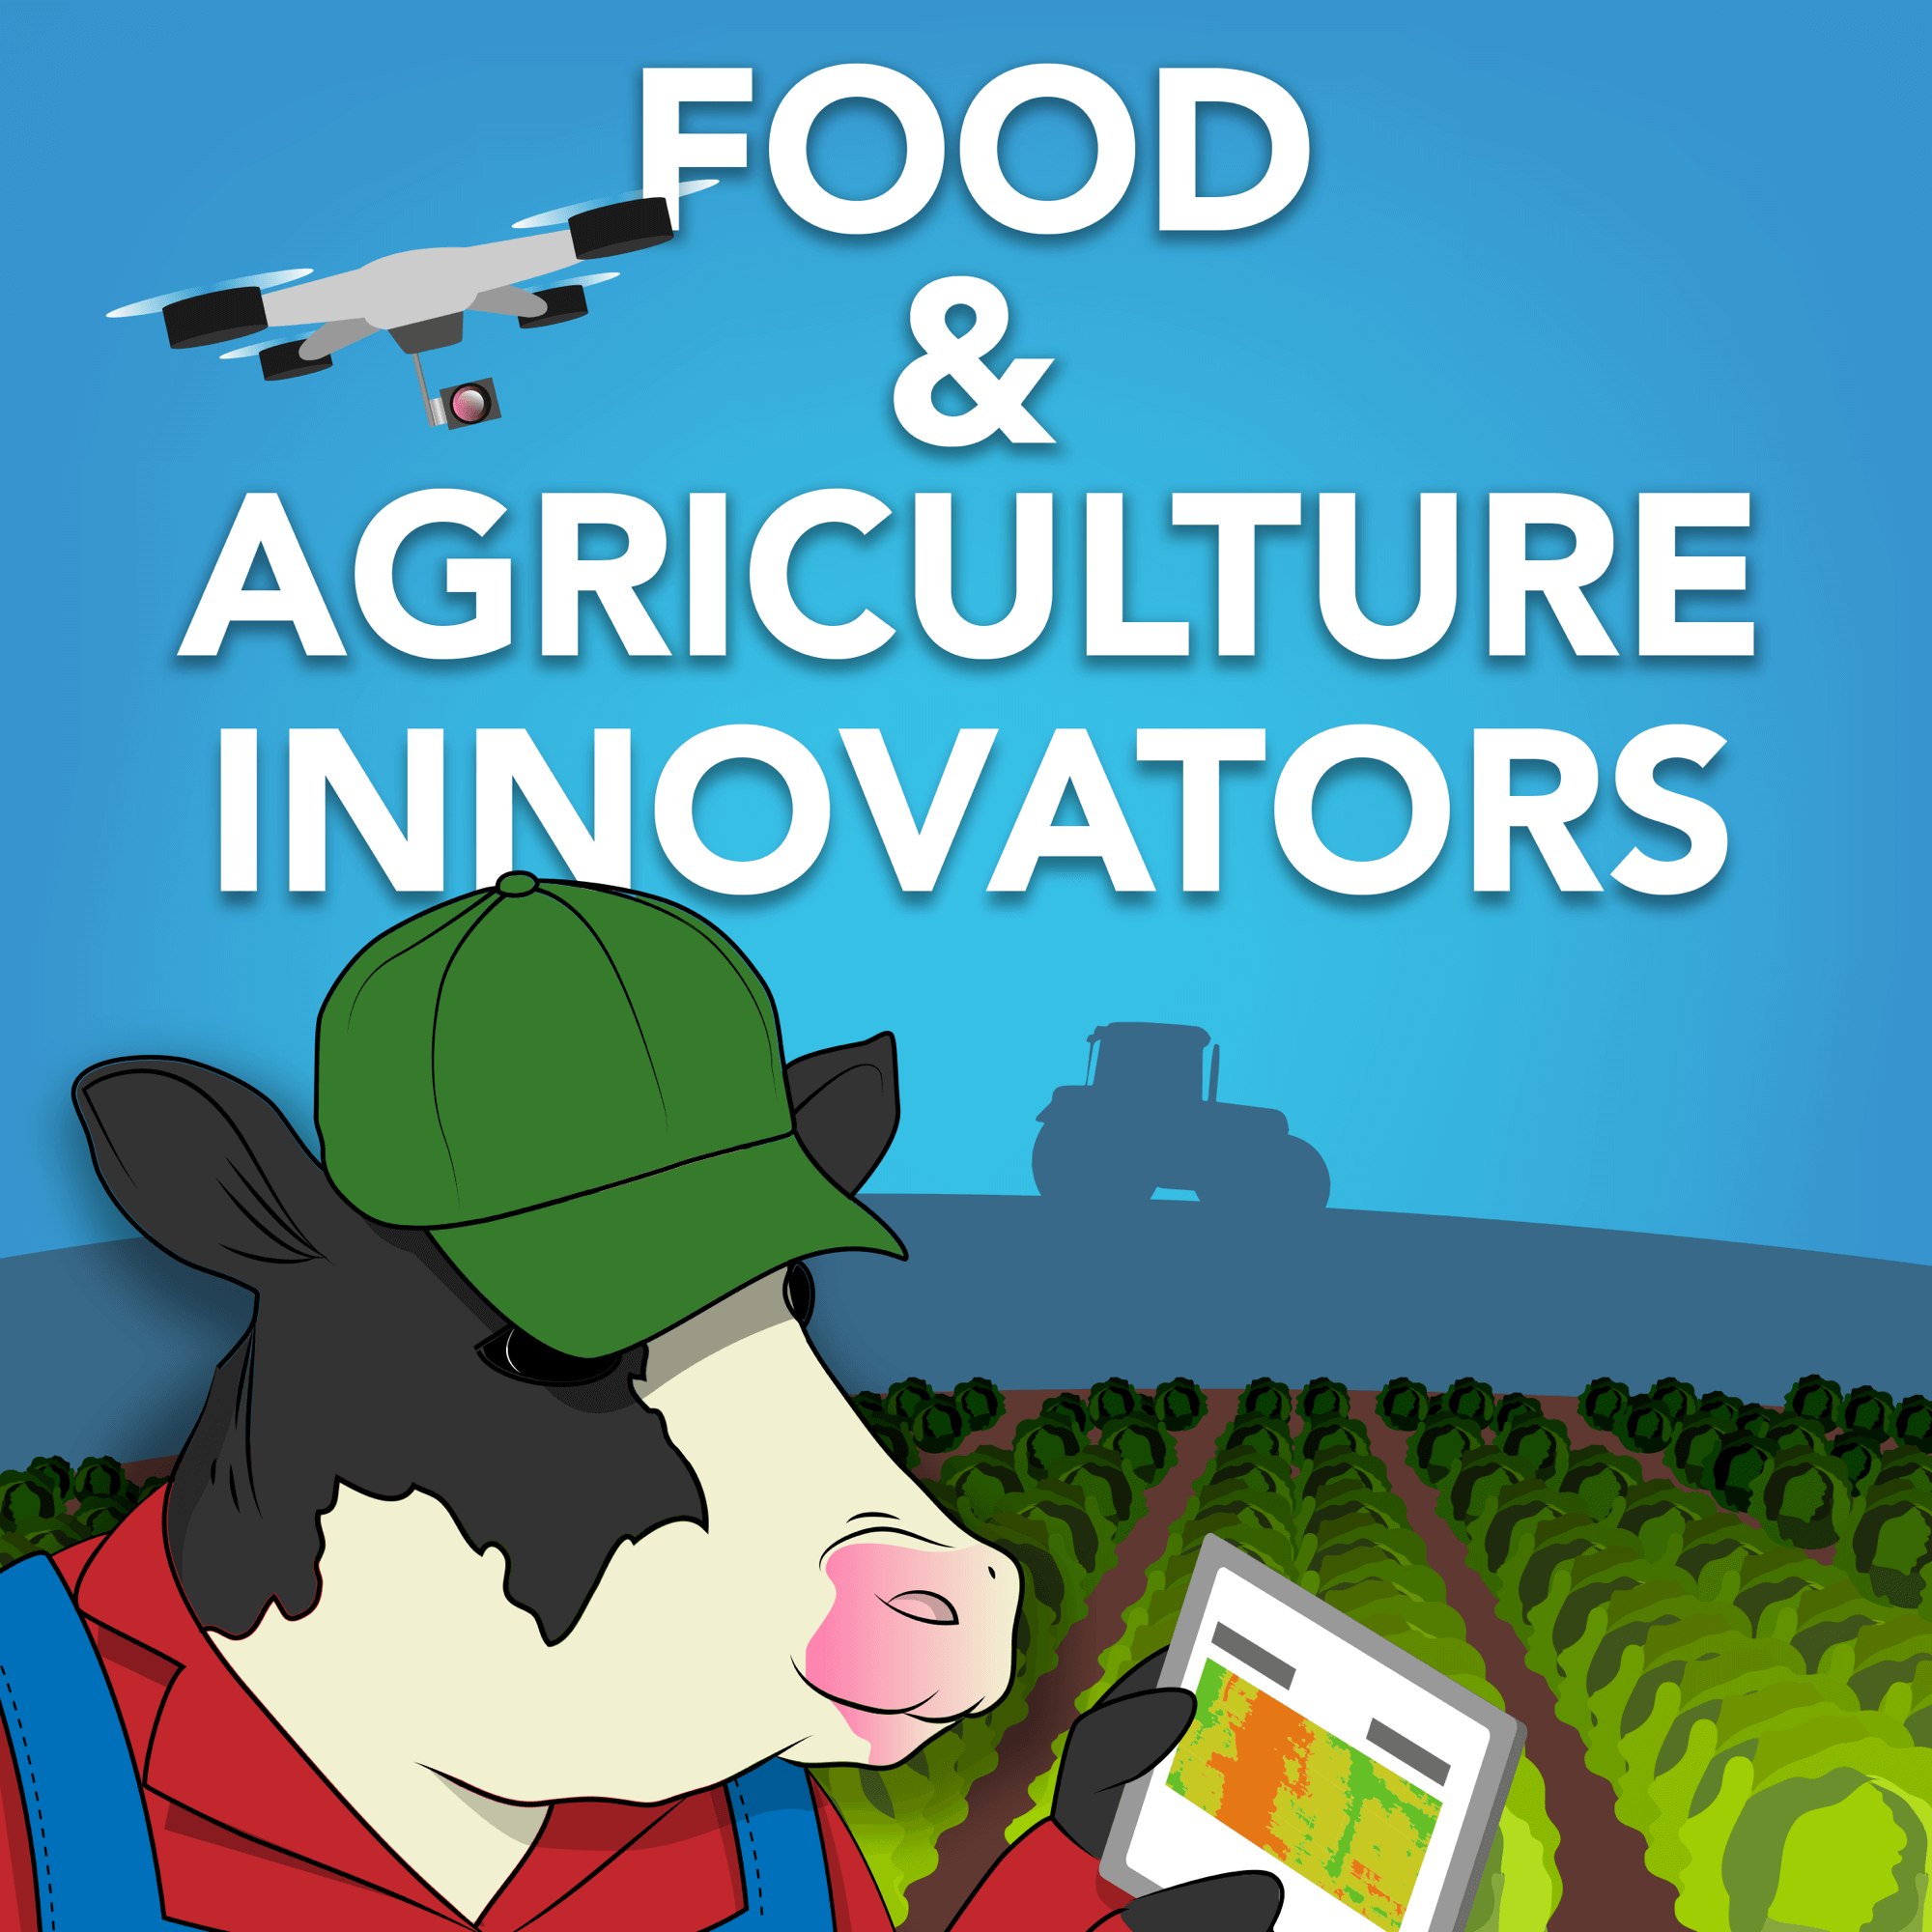 Food & Agriculture Innovators show art